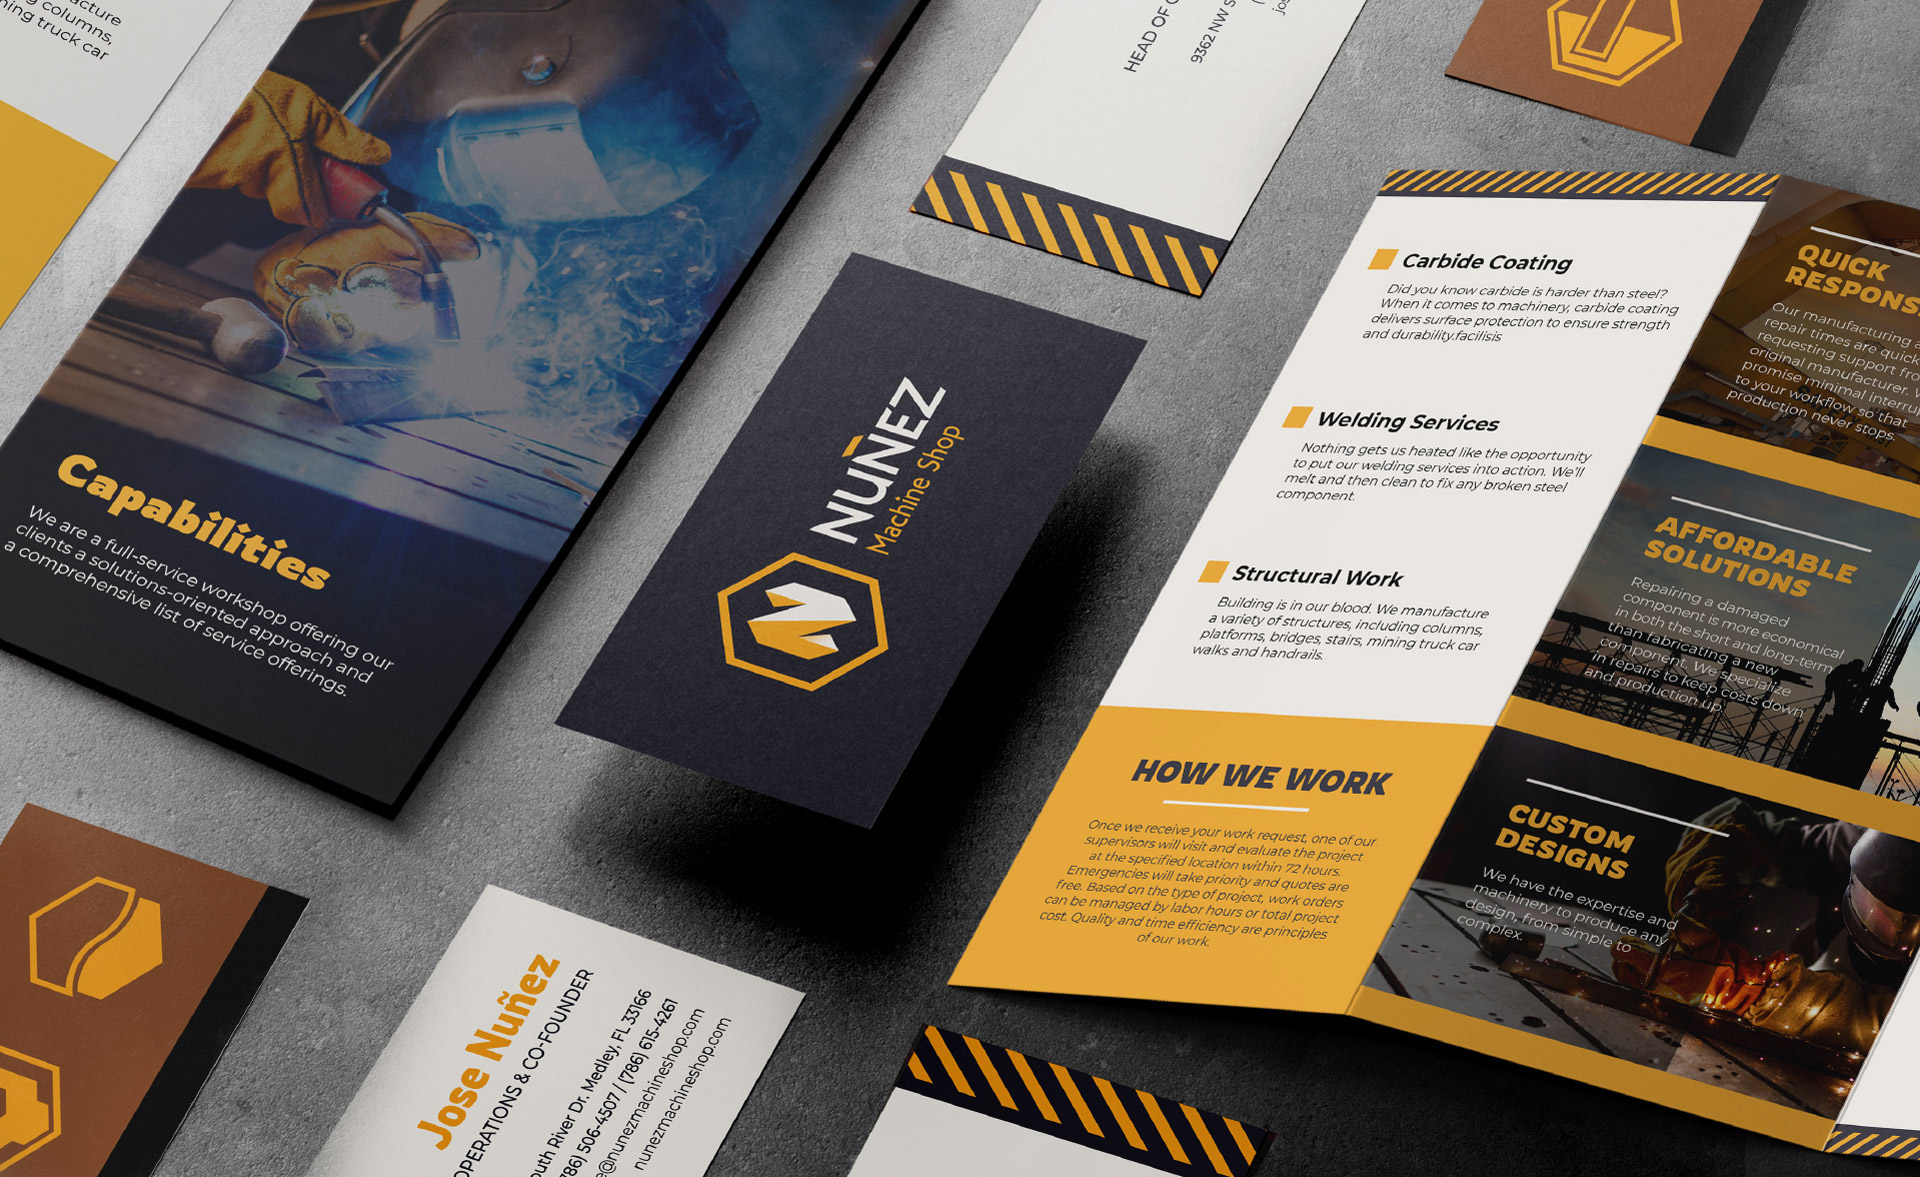 Nunez business cards and promotional brochure design by Kinetik Lab Miami